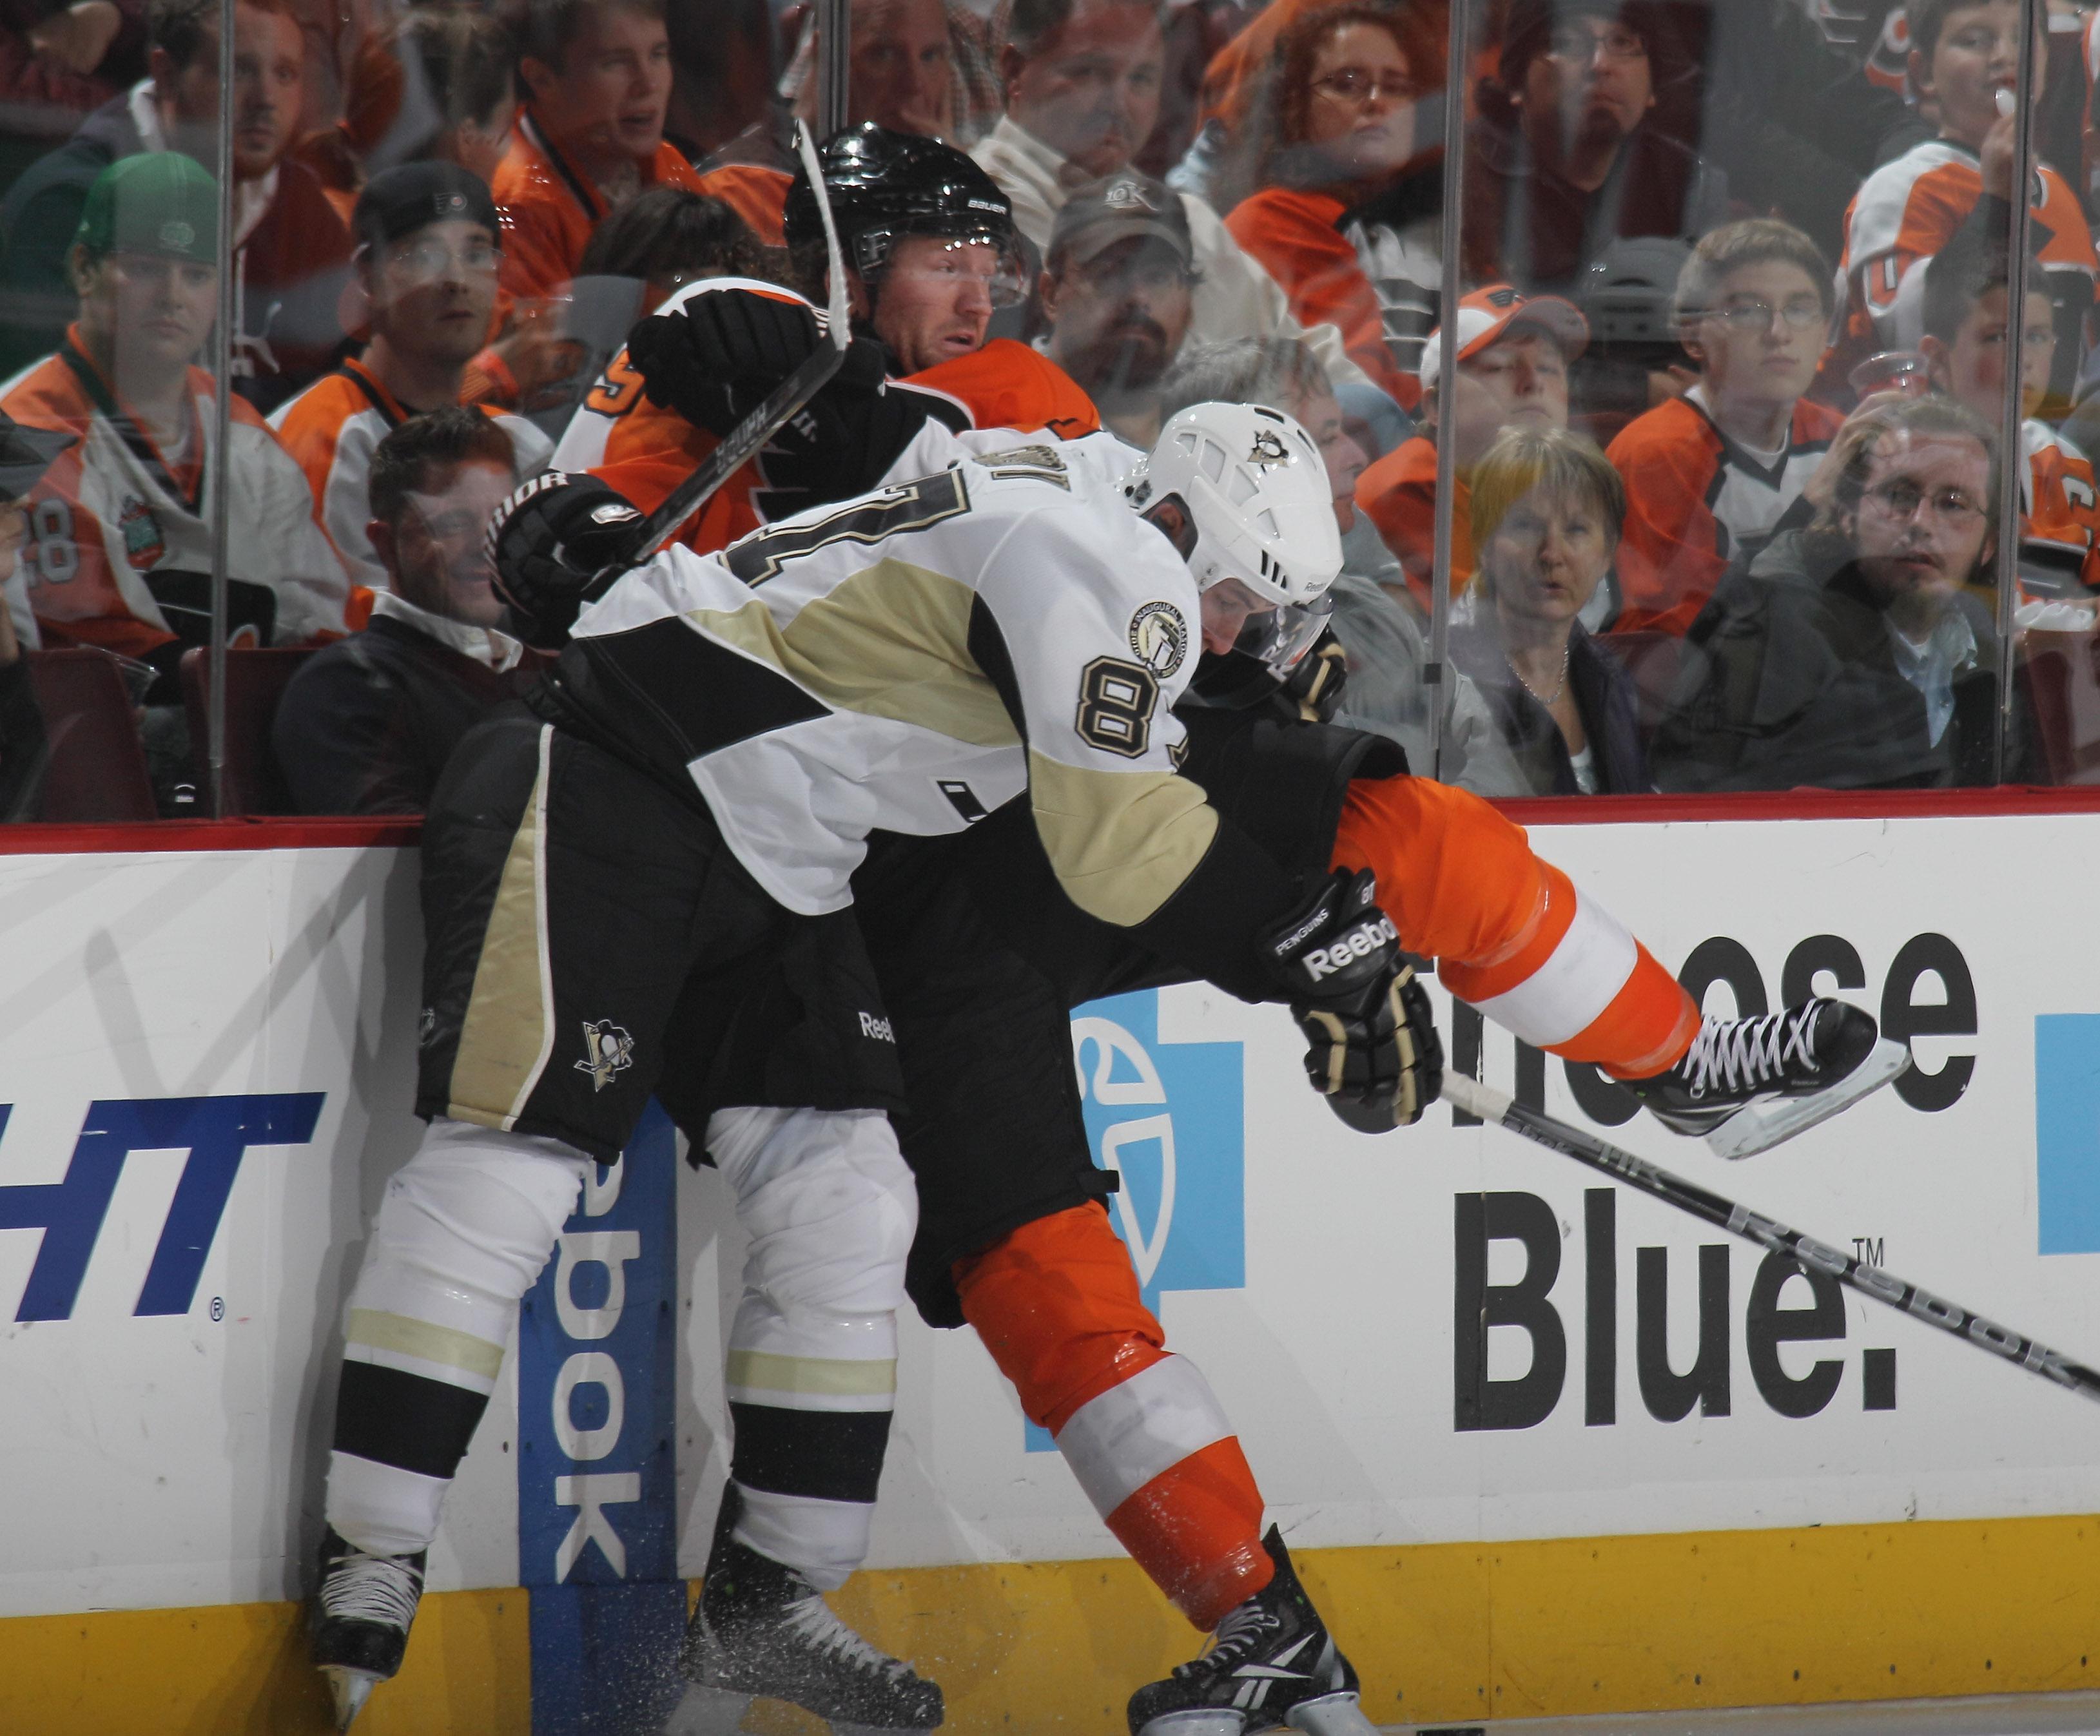 PHILADELPHIA - OCTOBER 16: Sidney Crosby #87 of the Pittsburgh Penguins hits Scott Hartnell #19 of the Philadelphia Flyers at the Wells Fargo Center on October 16, 2010 in Philadelphia, Pennsylvania.  (Photo by Bruce Bennett/Getty Images)